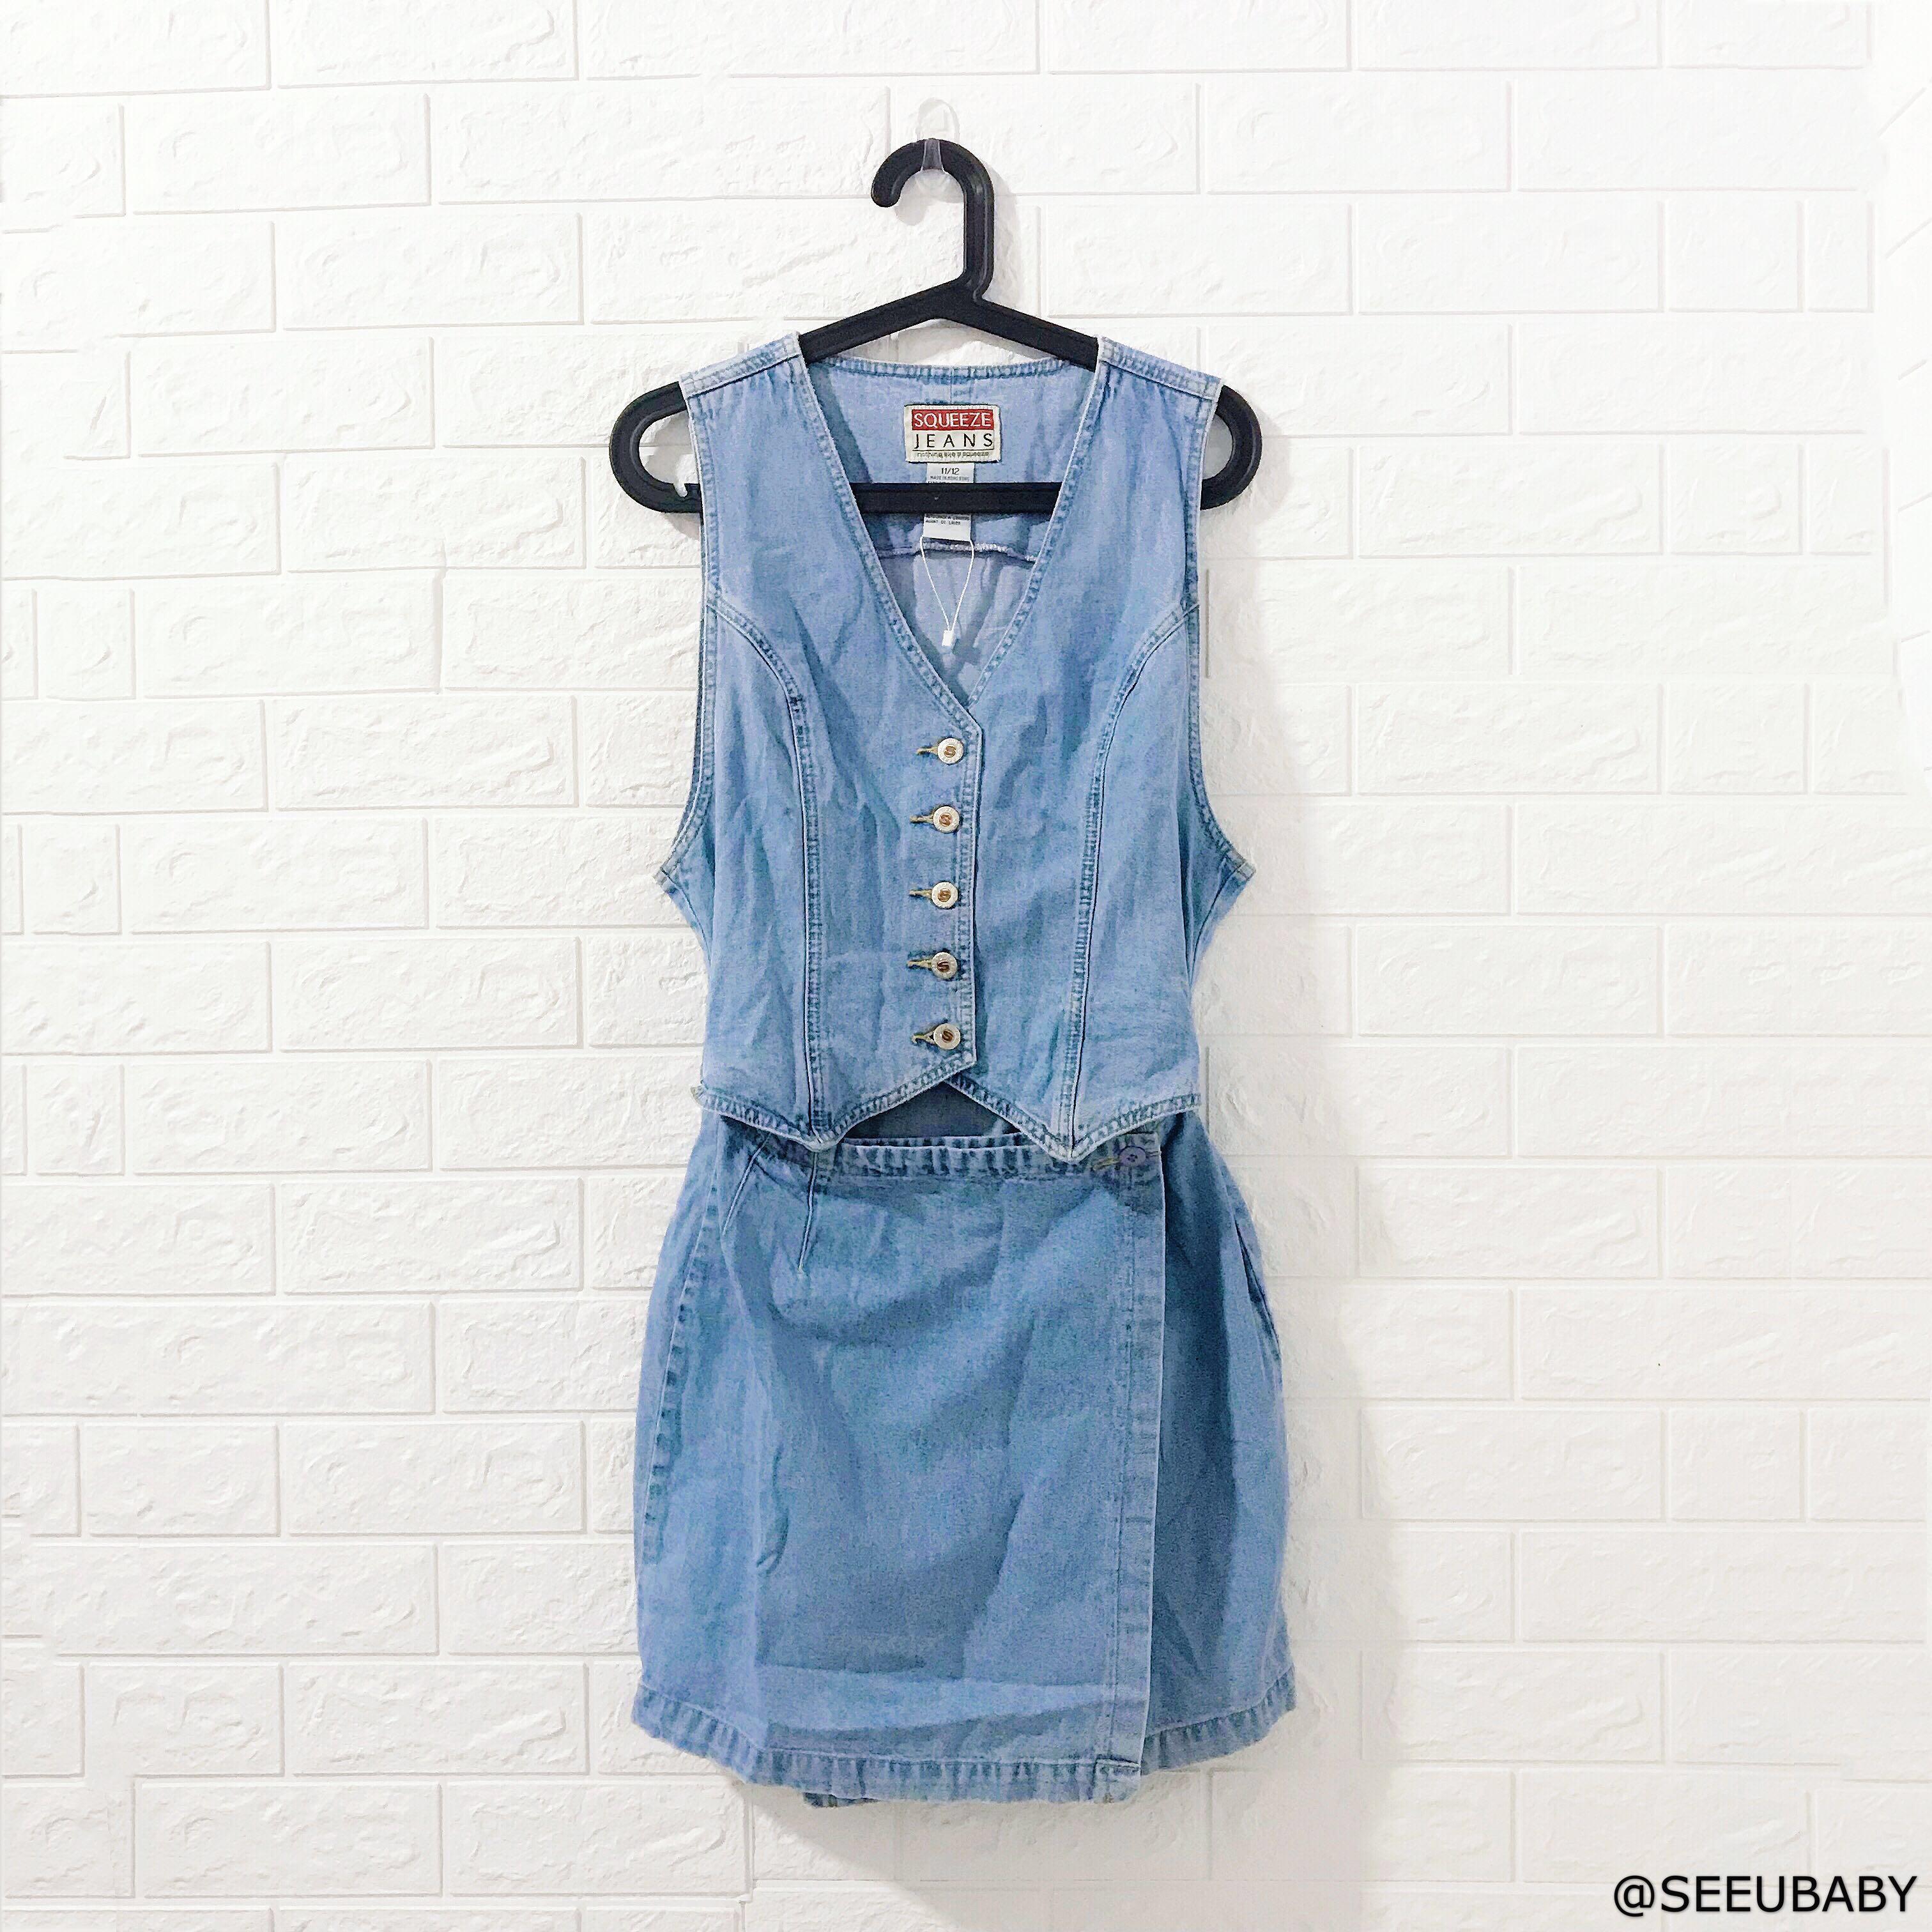 c82d6e8720 vintage denim one-piece overall shirt dress